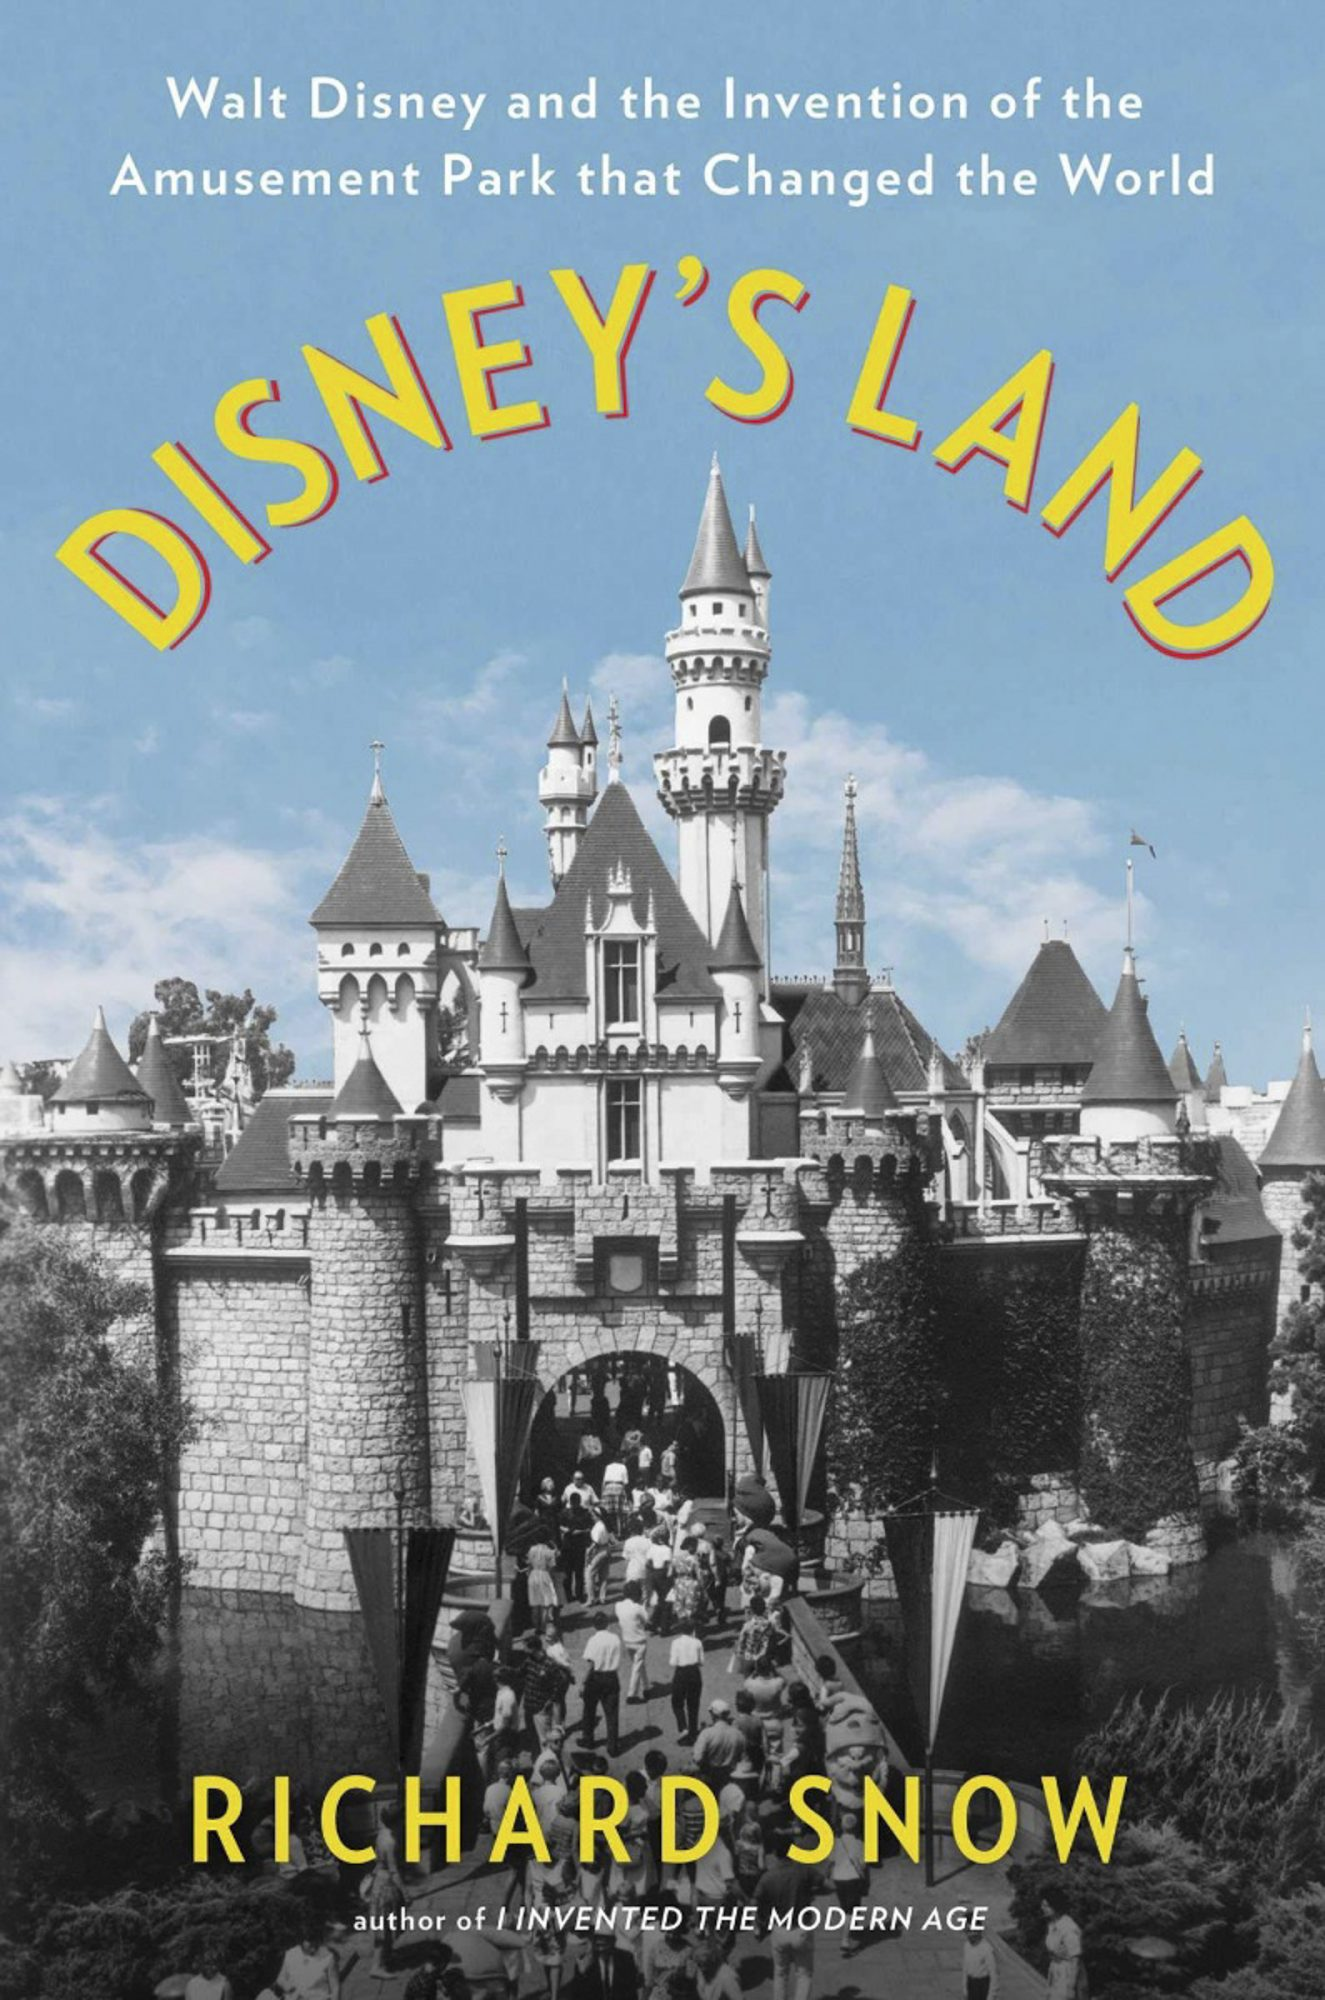 Disney's Land by Richard Snow